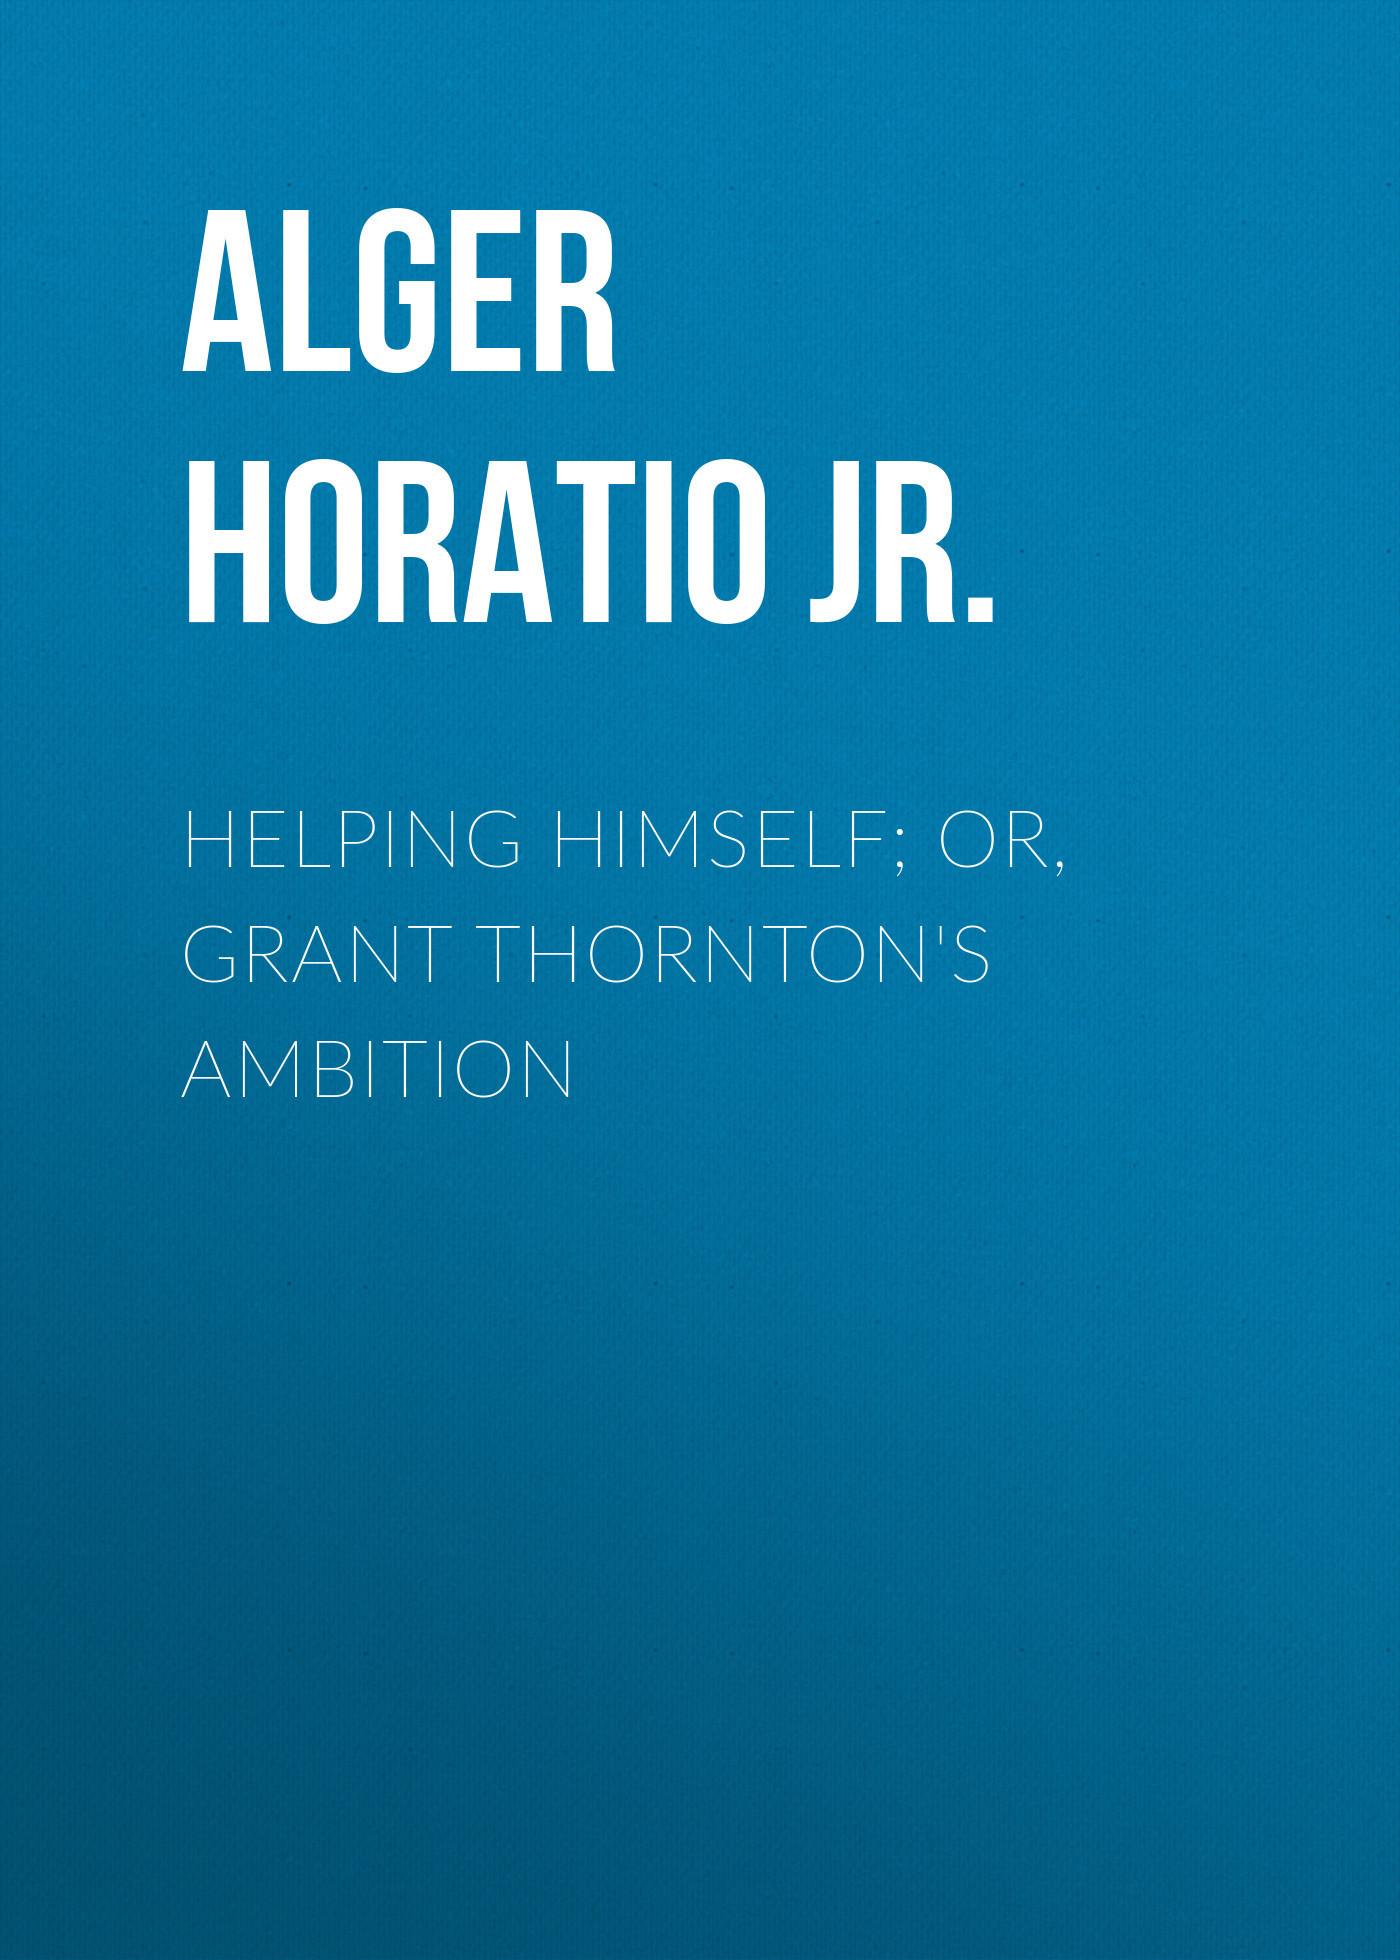 Alger Horatio Jr. Helping Himself; Or, Grant Thornton's Ambition horatio alger jr bernard brooks adventures the experience of a plucky boy